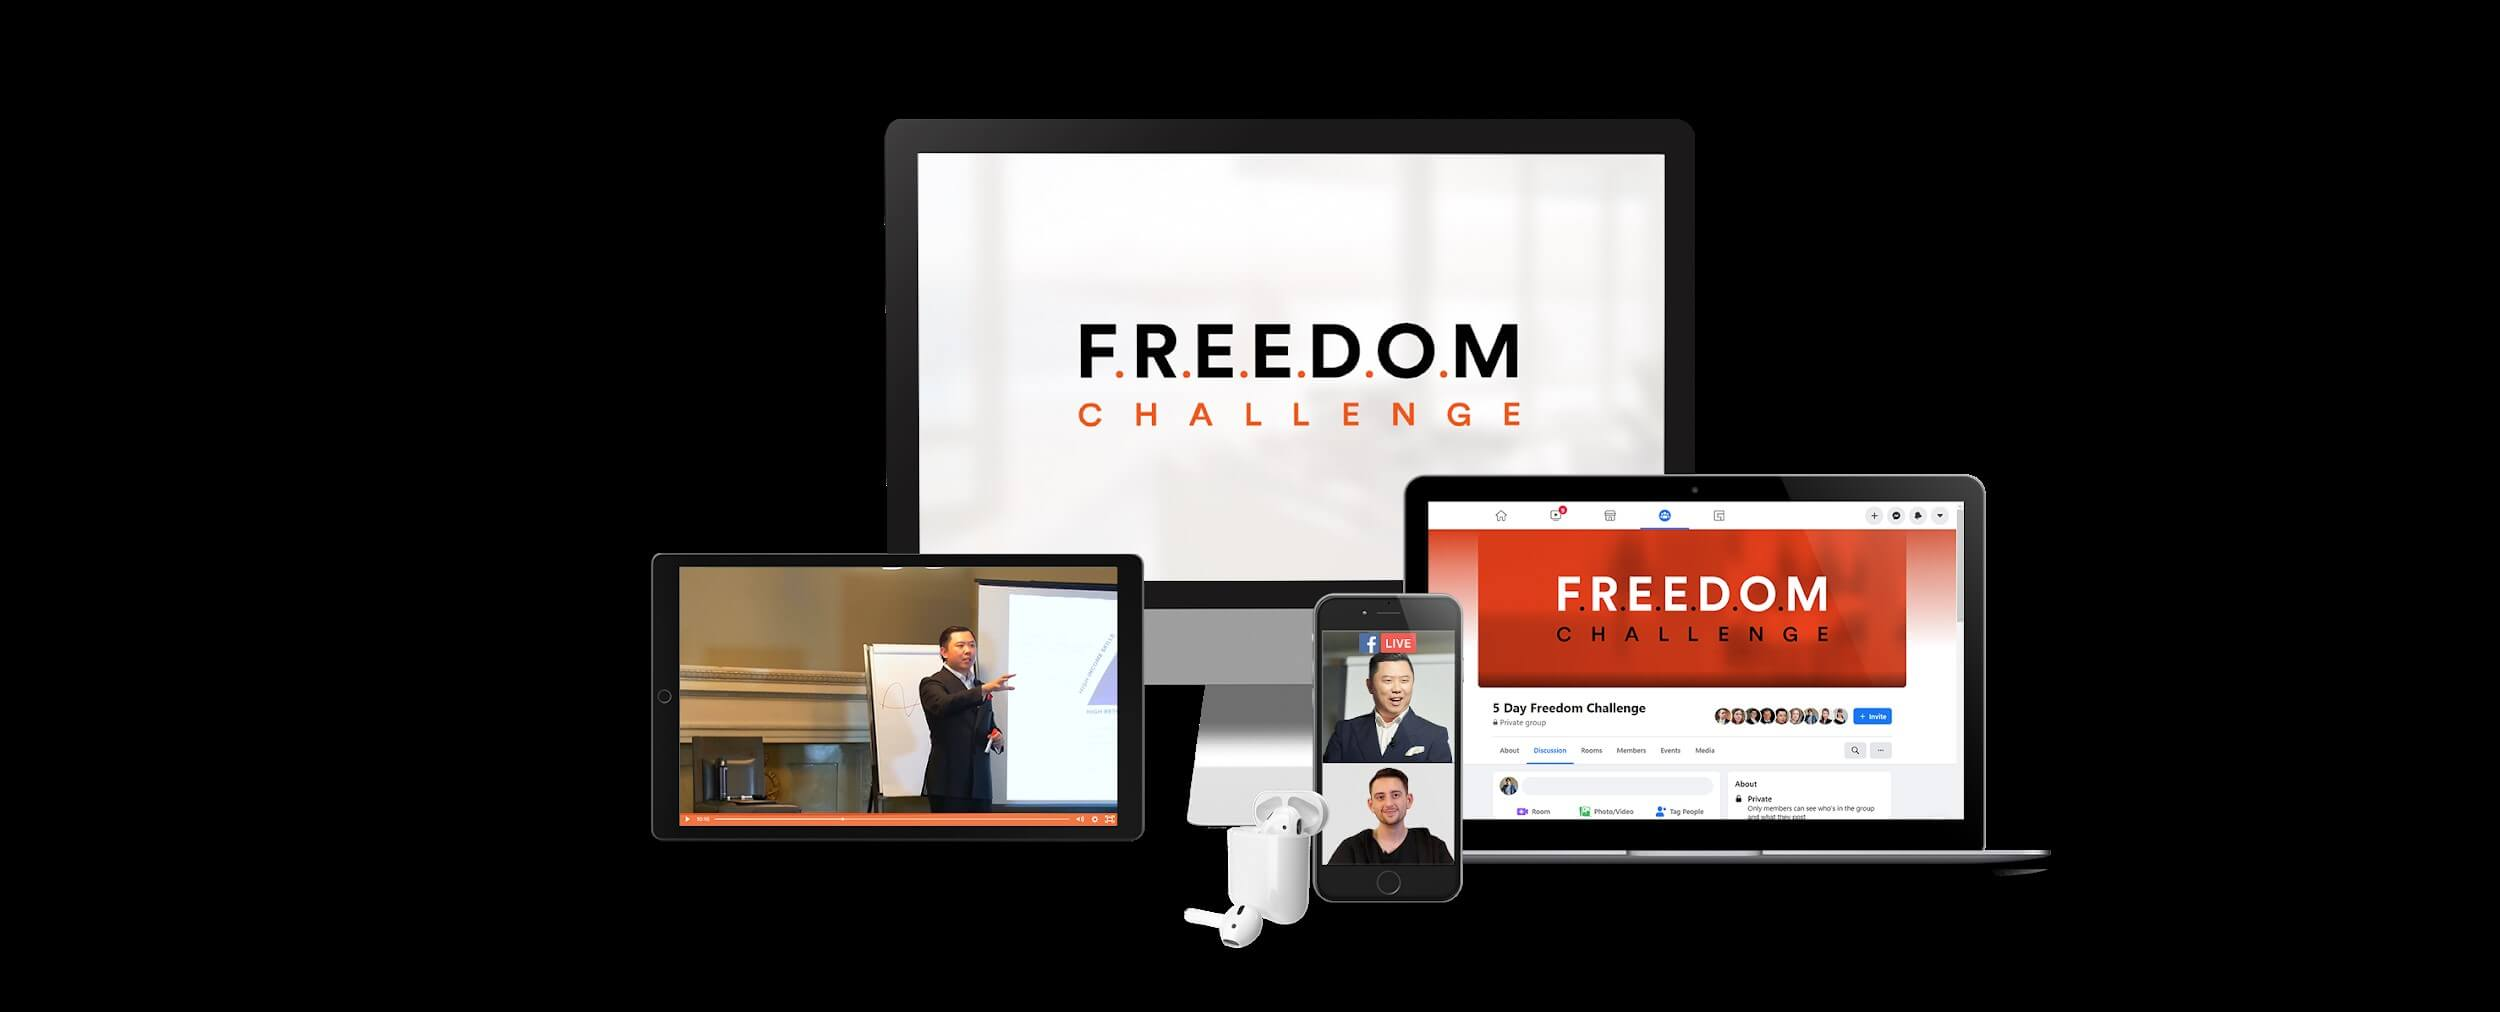 Live Freedom Challenge